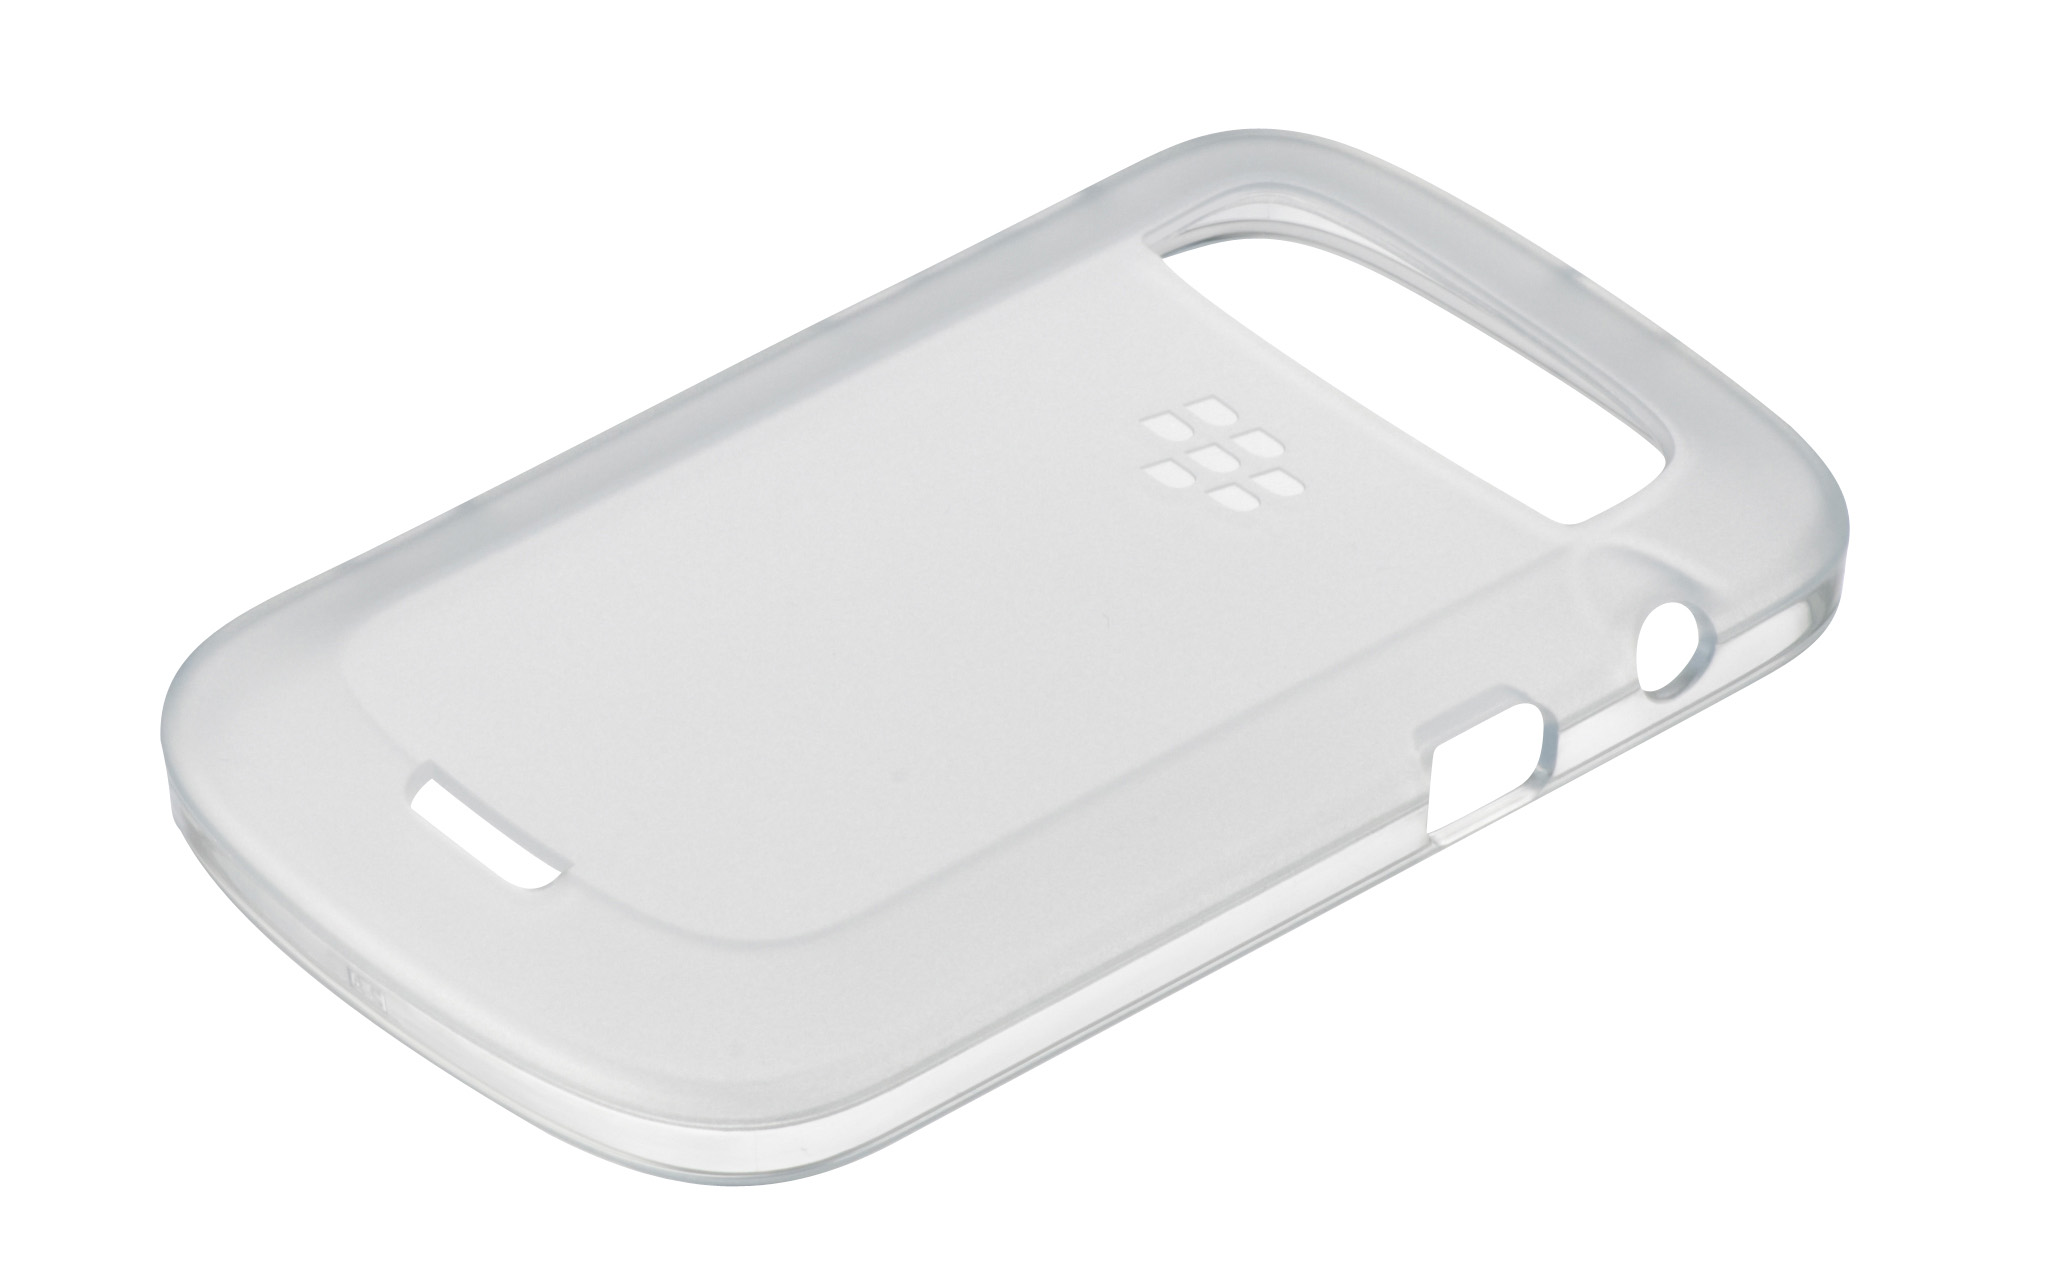 original-blackberry-soft-shell-9900-translucent